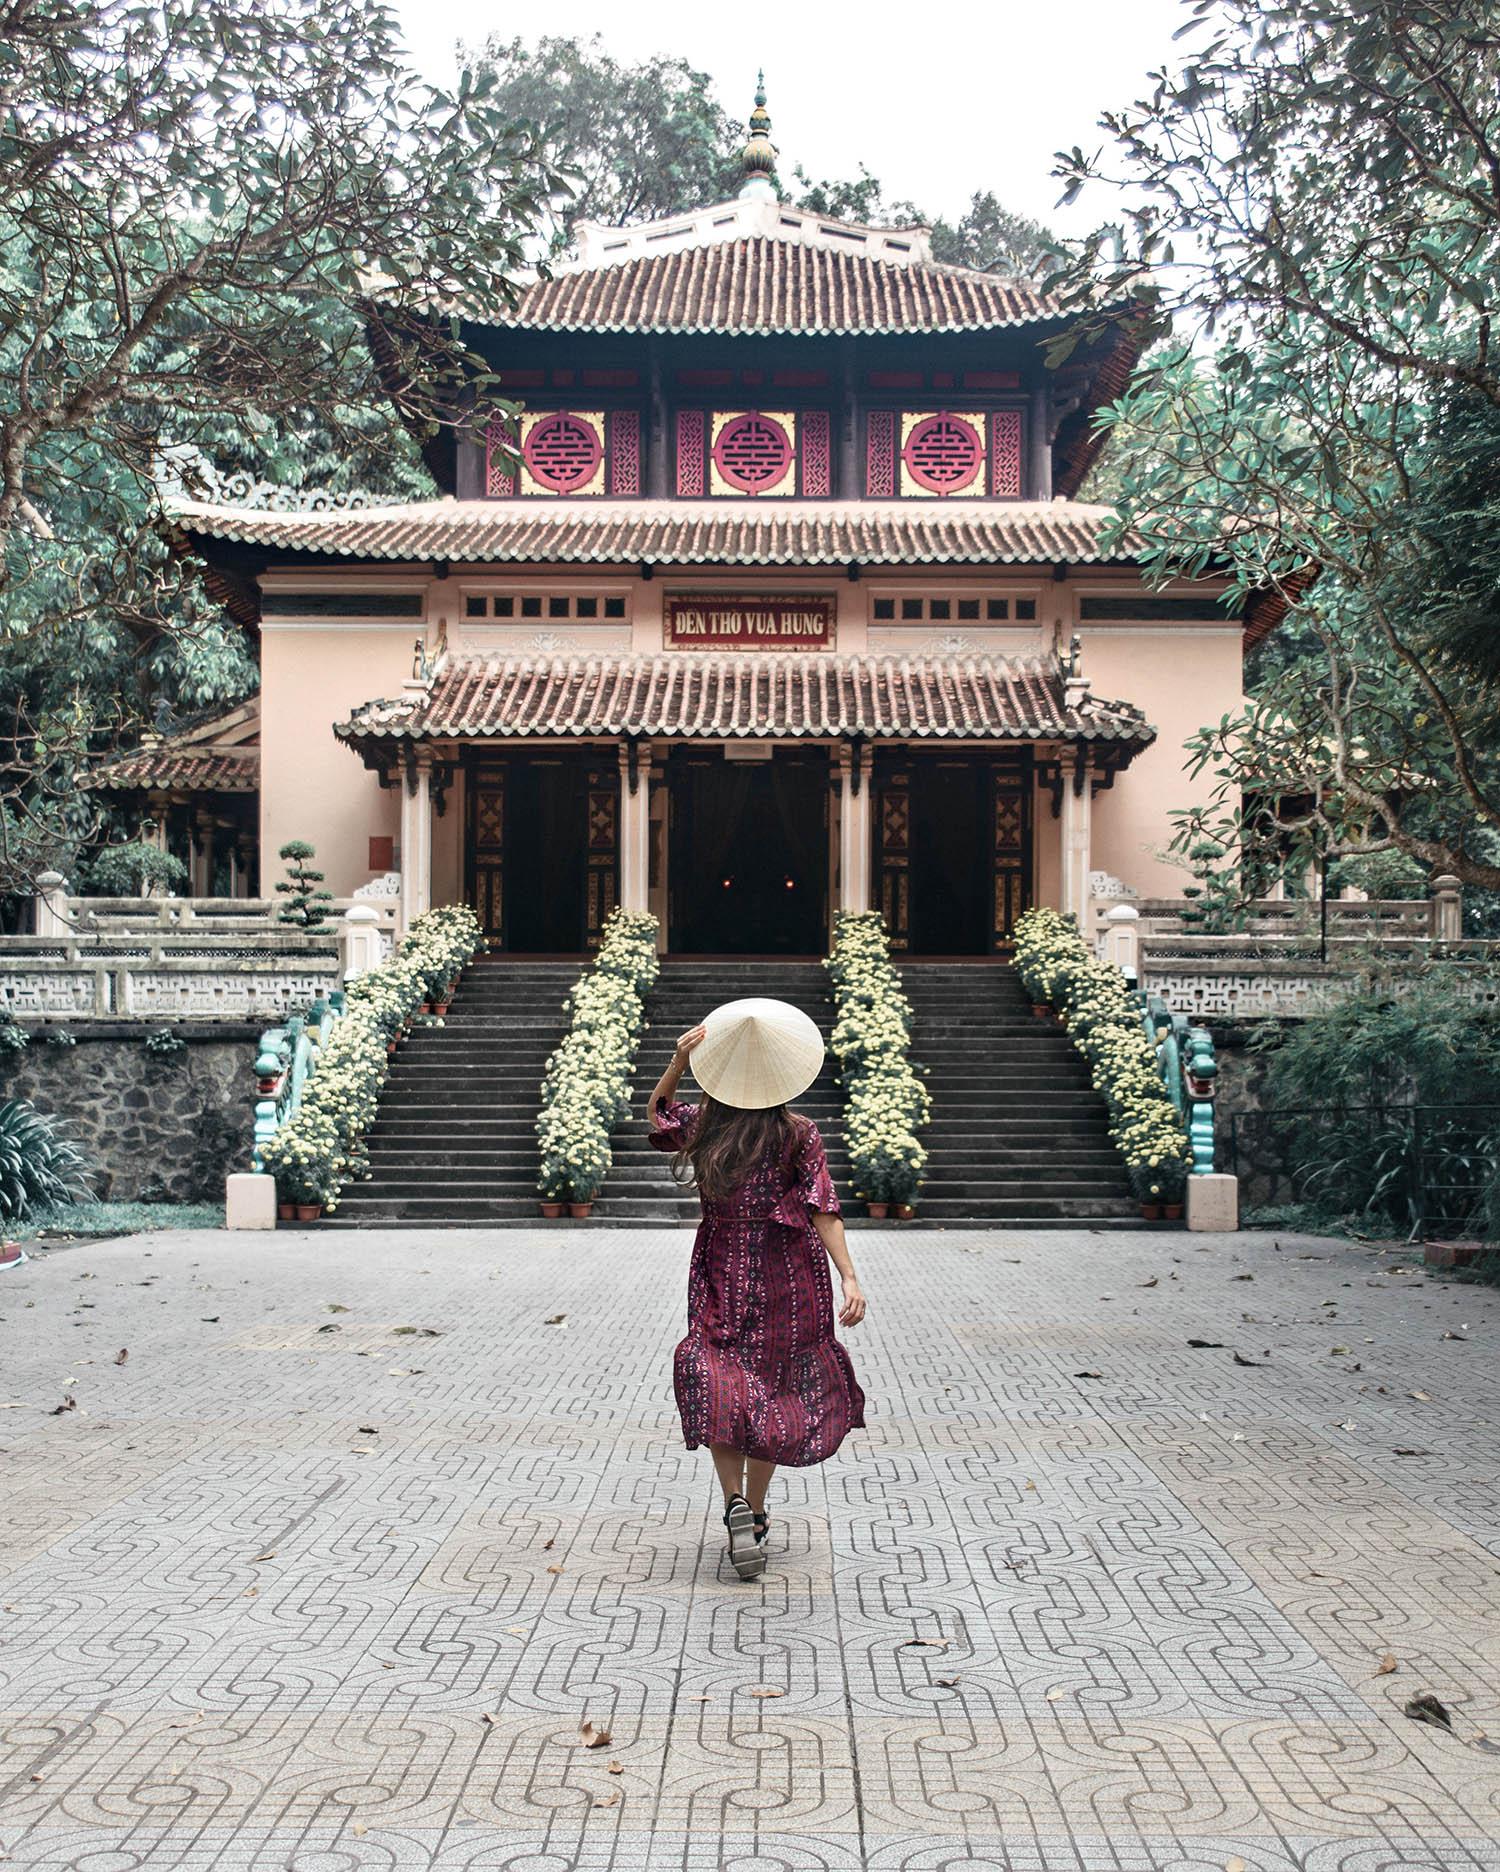 Girl with conical hat walking towards Đền Thờ Vua Hùng - Buddhist temple in Ho Chi Minh City, Vietnam